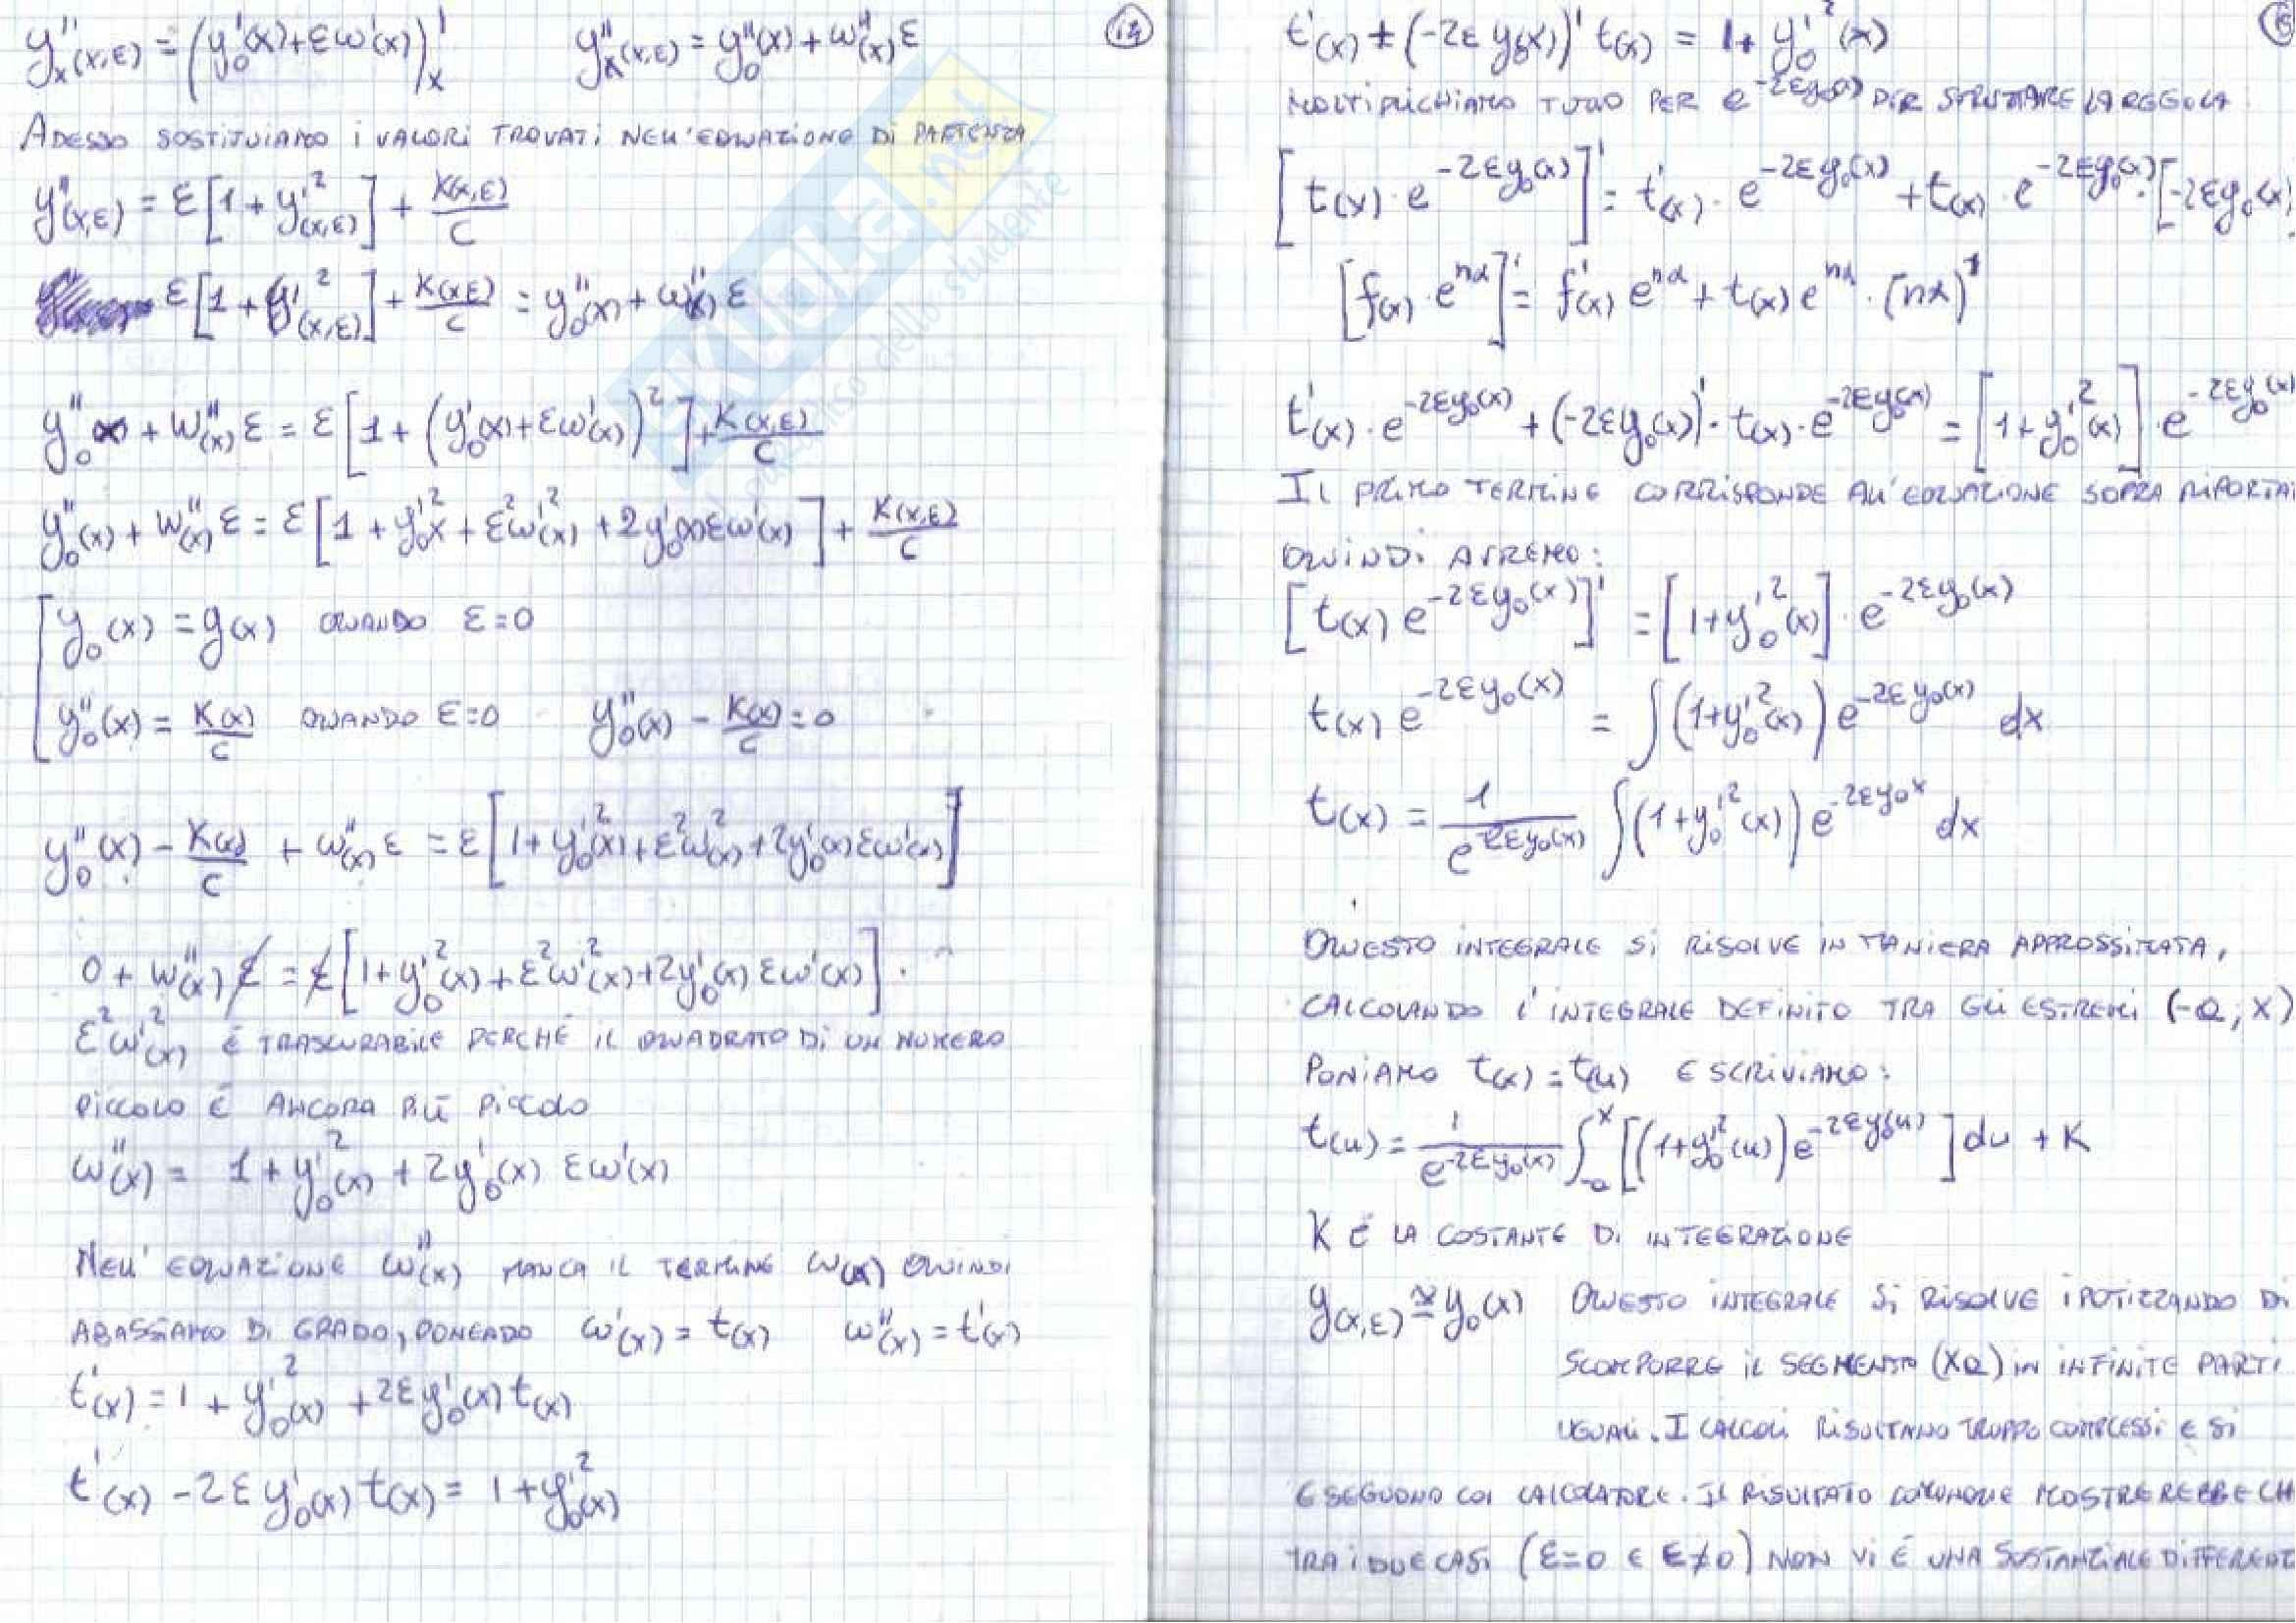 Matematica - Esercitazioni Pag. 16